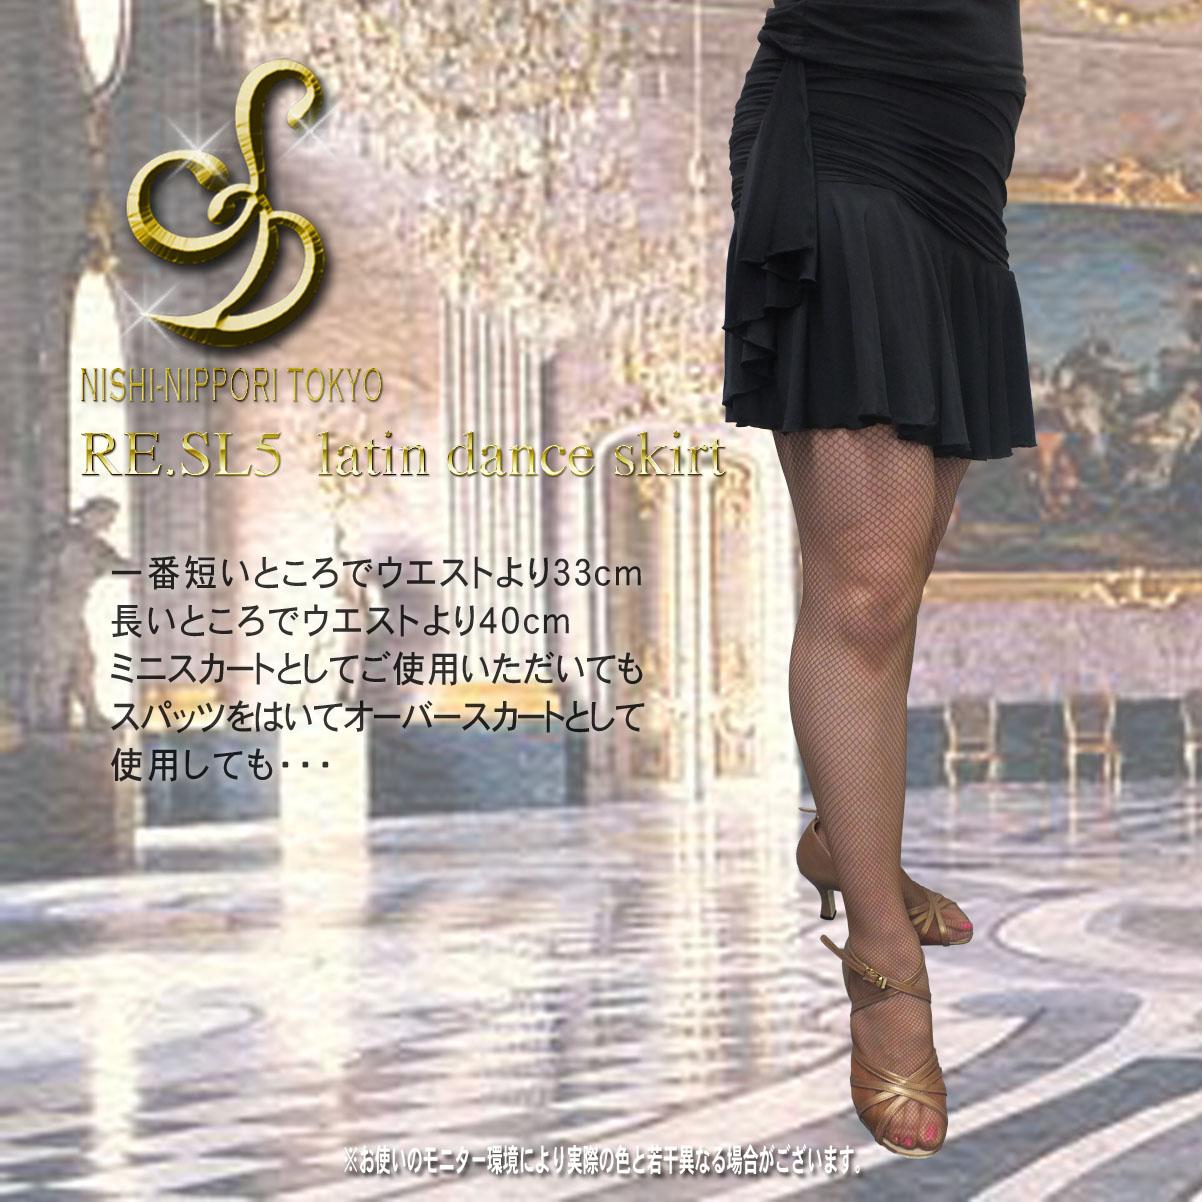 RE.SL5 ラテンスカート001